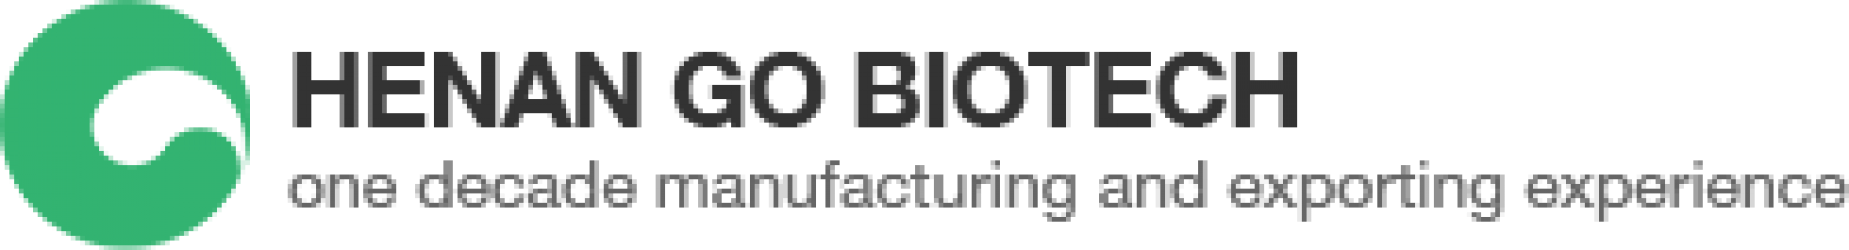 Hot-selling plasticizer chemicals manufacturers